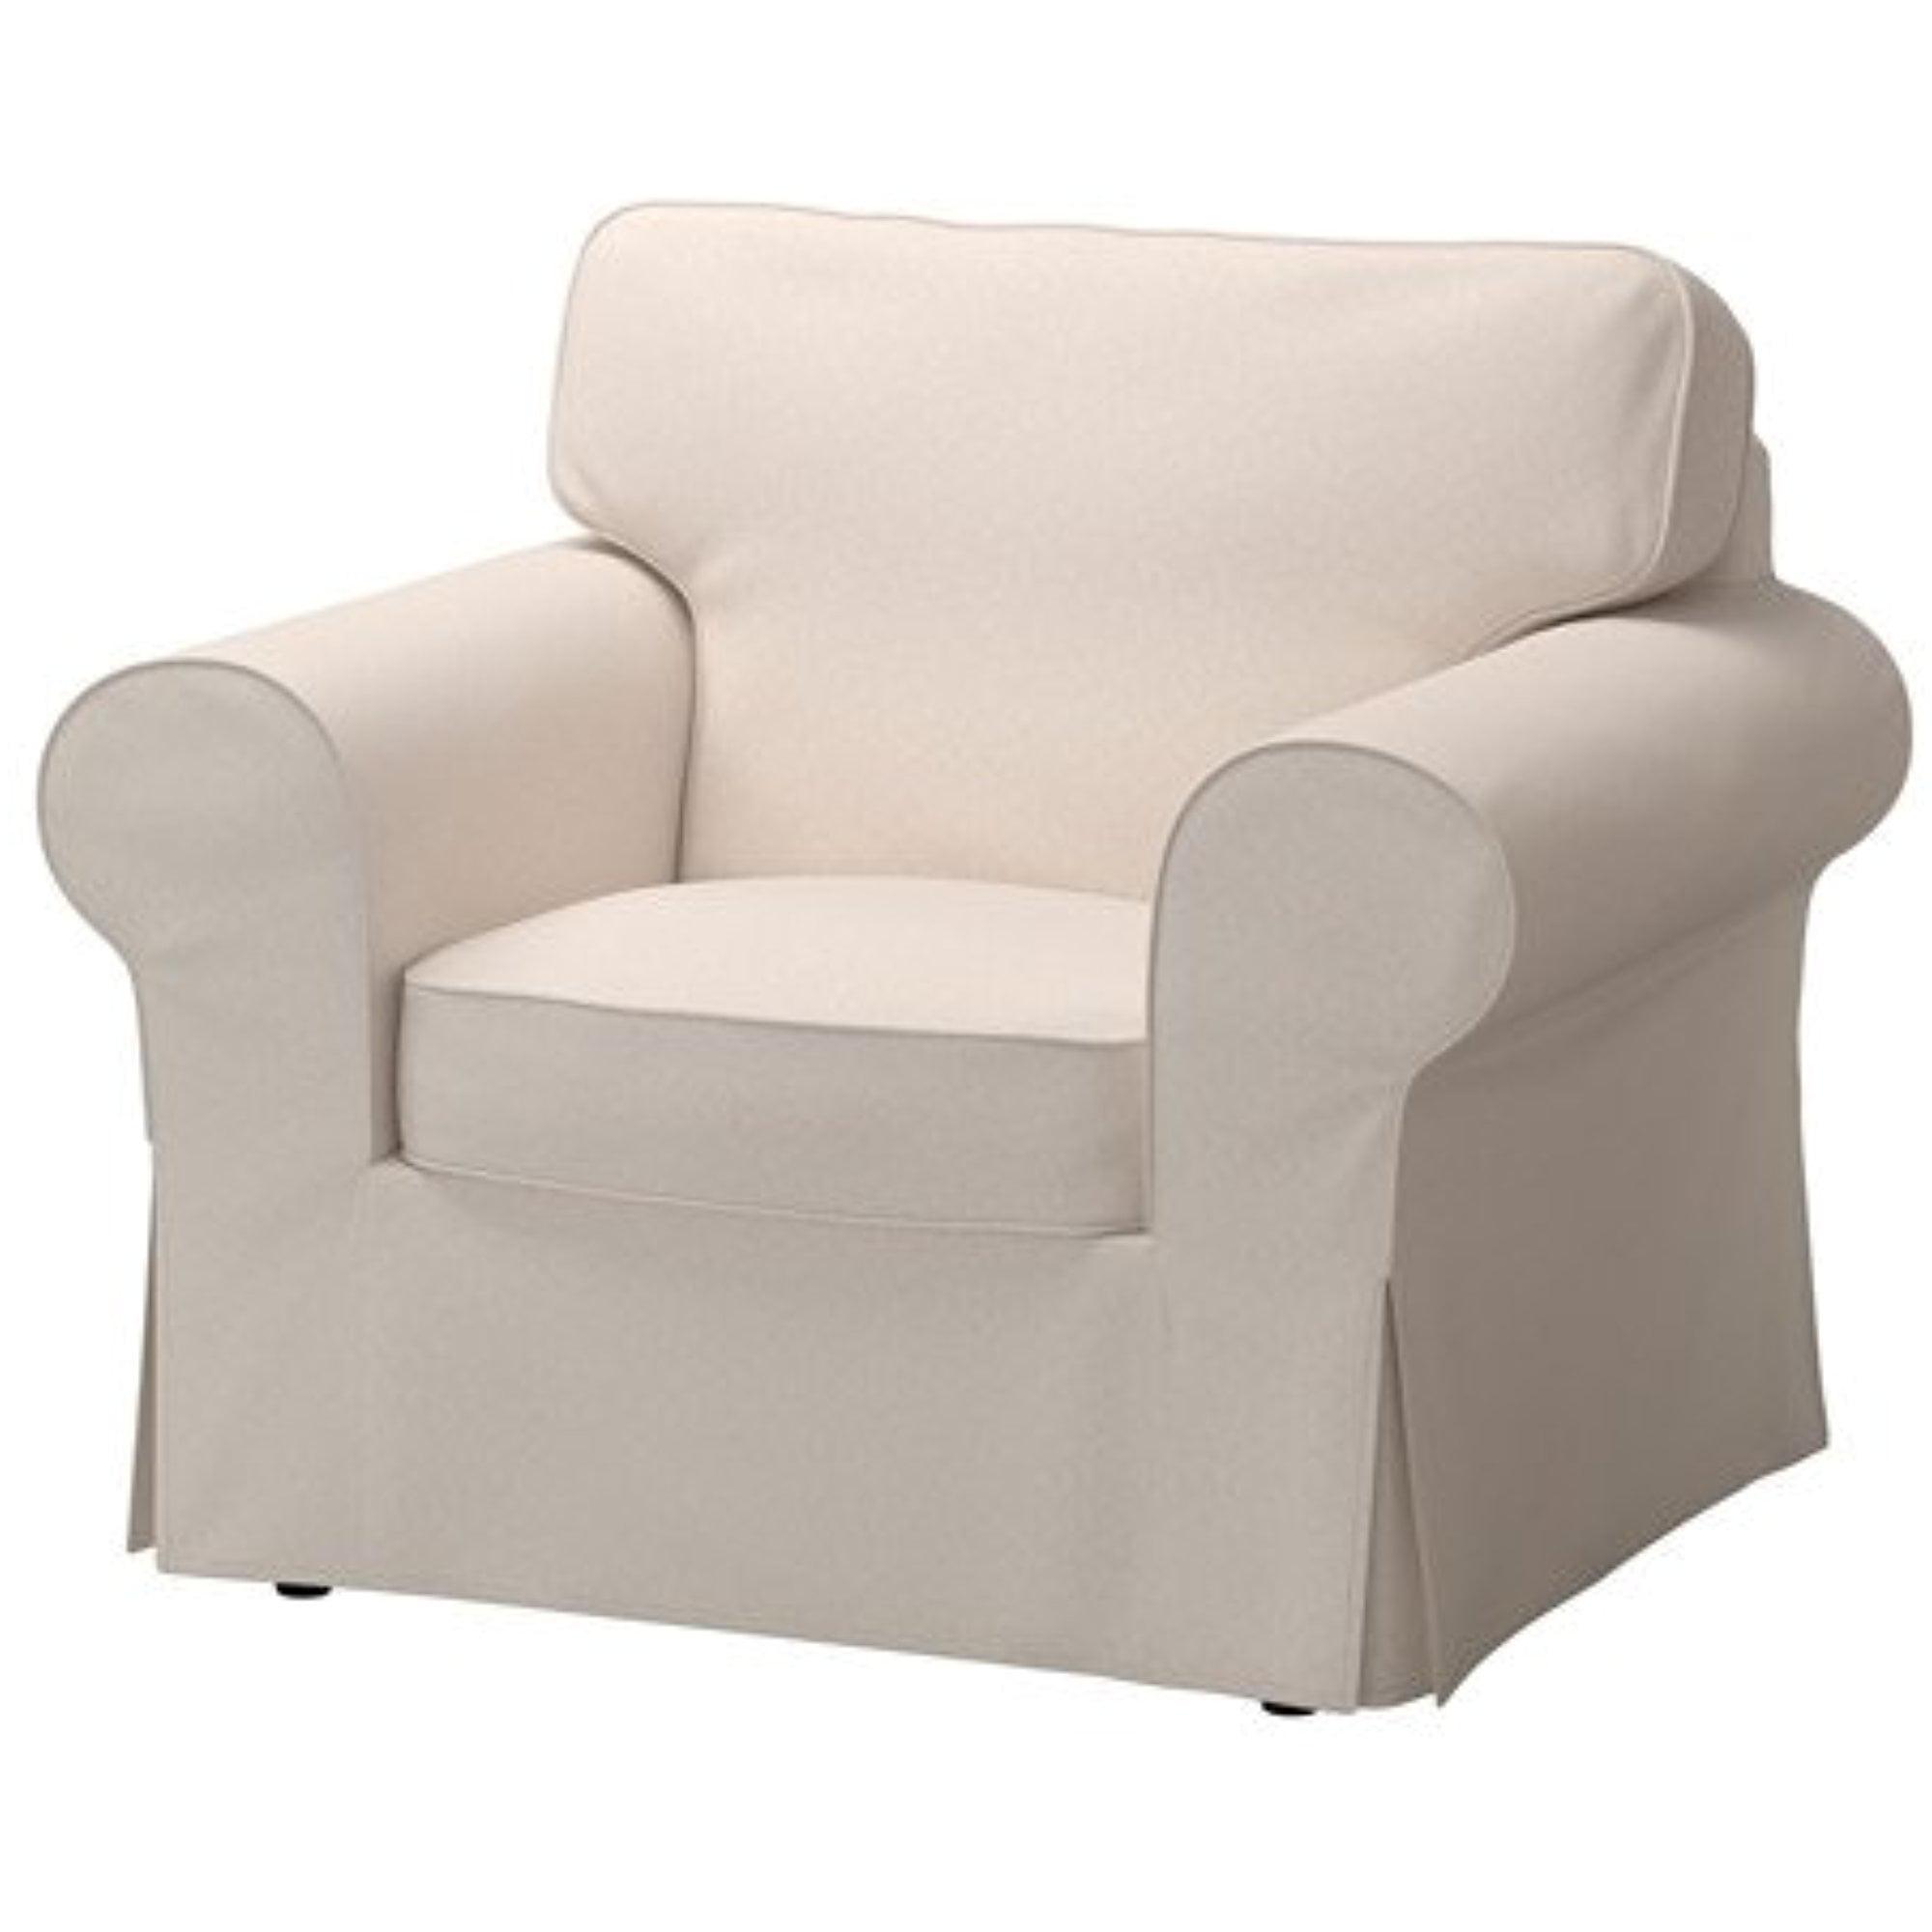 Ikea Chair cover, Lofallet beige 228.8520.3422